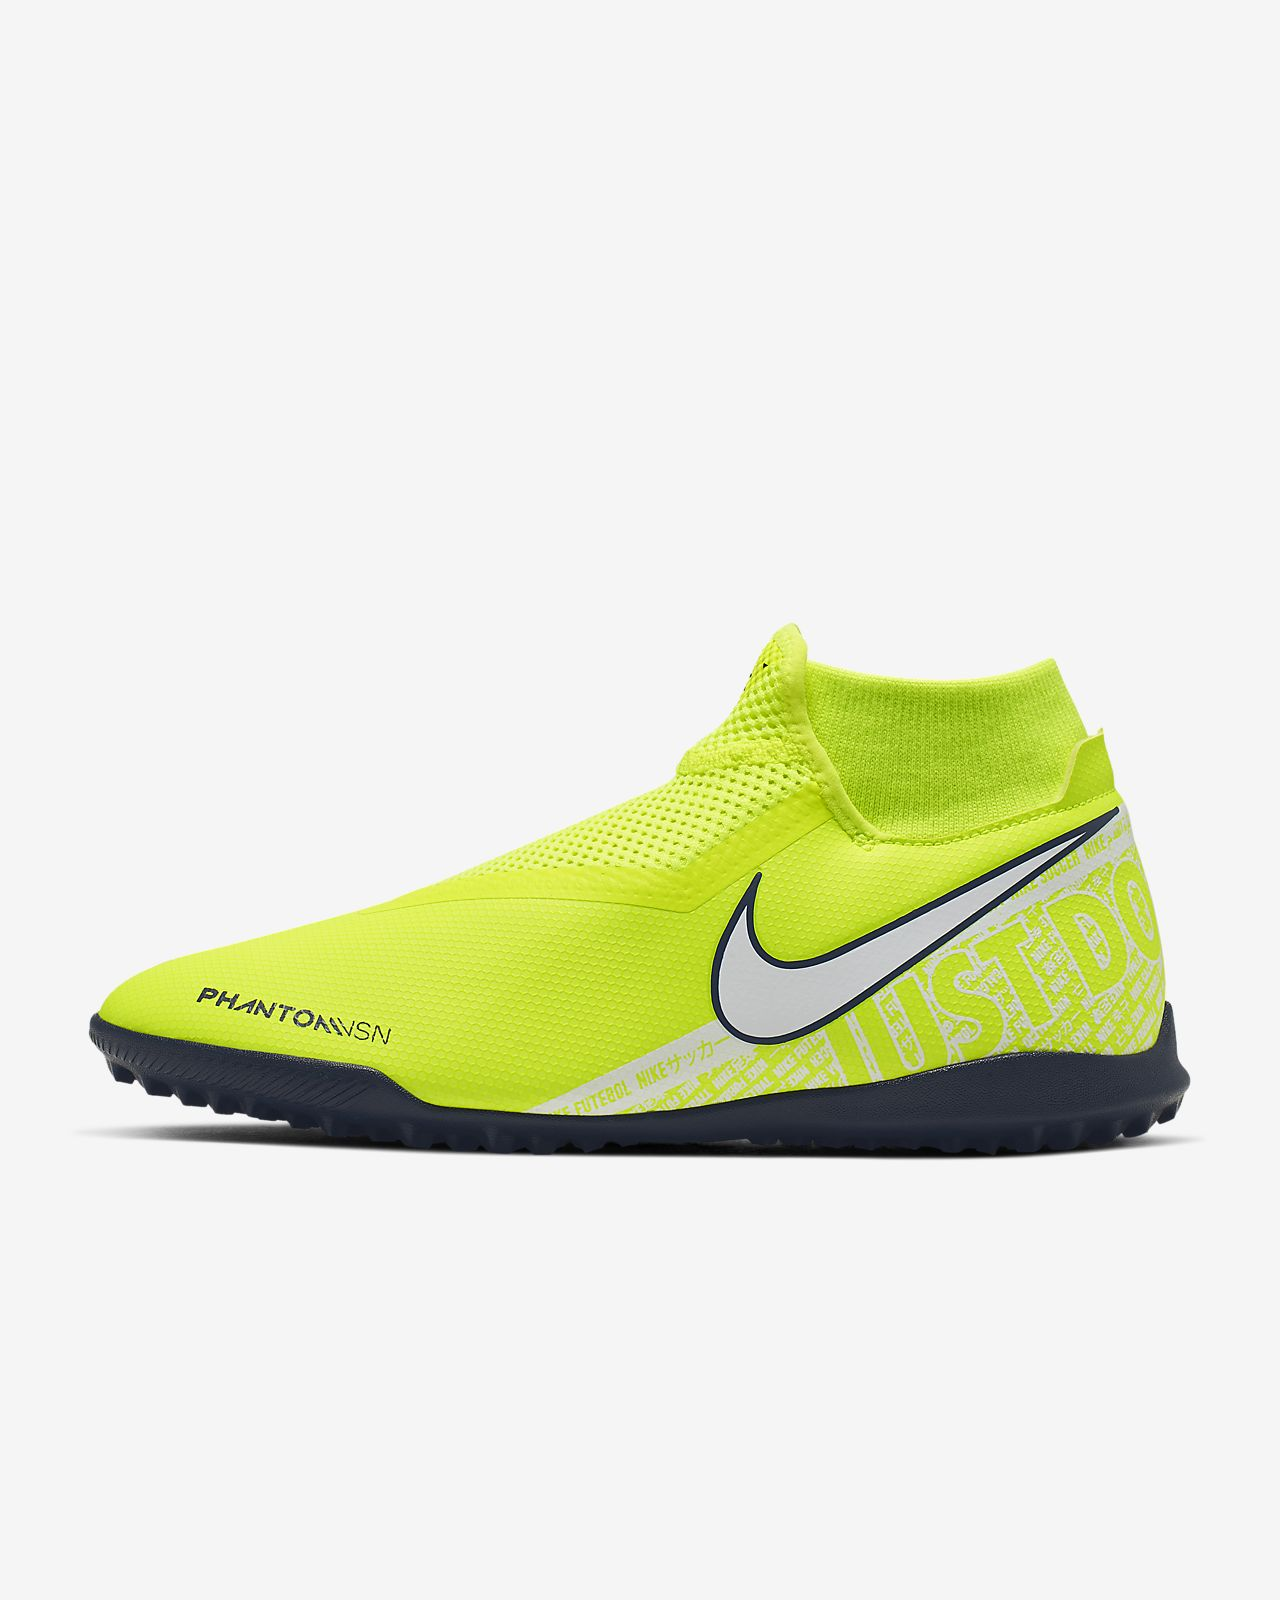 Nike Phantom Vision Academy Dynamic Fit TF 人工草皮足球釘鞋